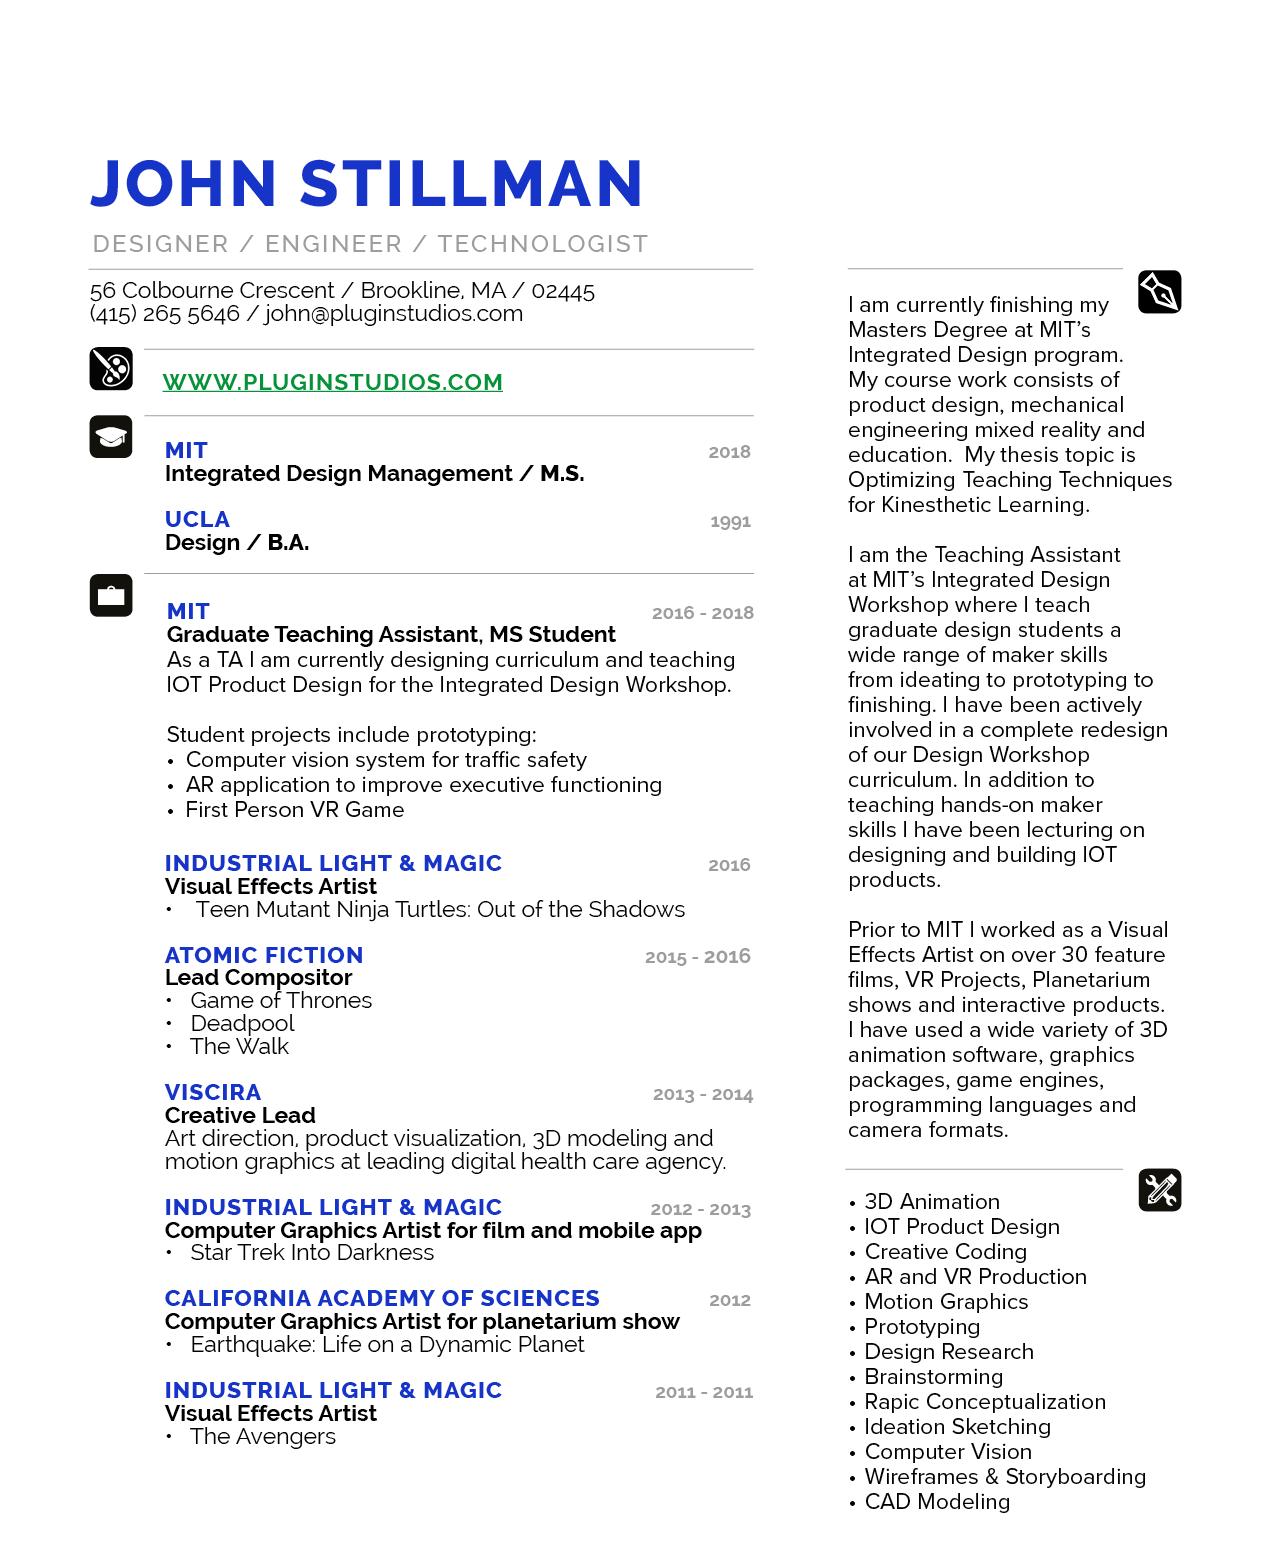 StillmanResume3-28-18.png